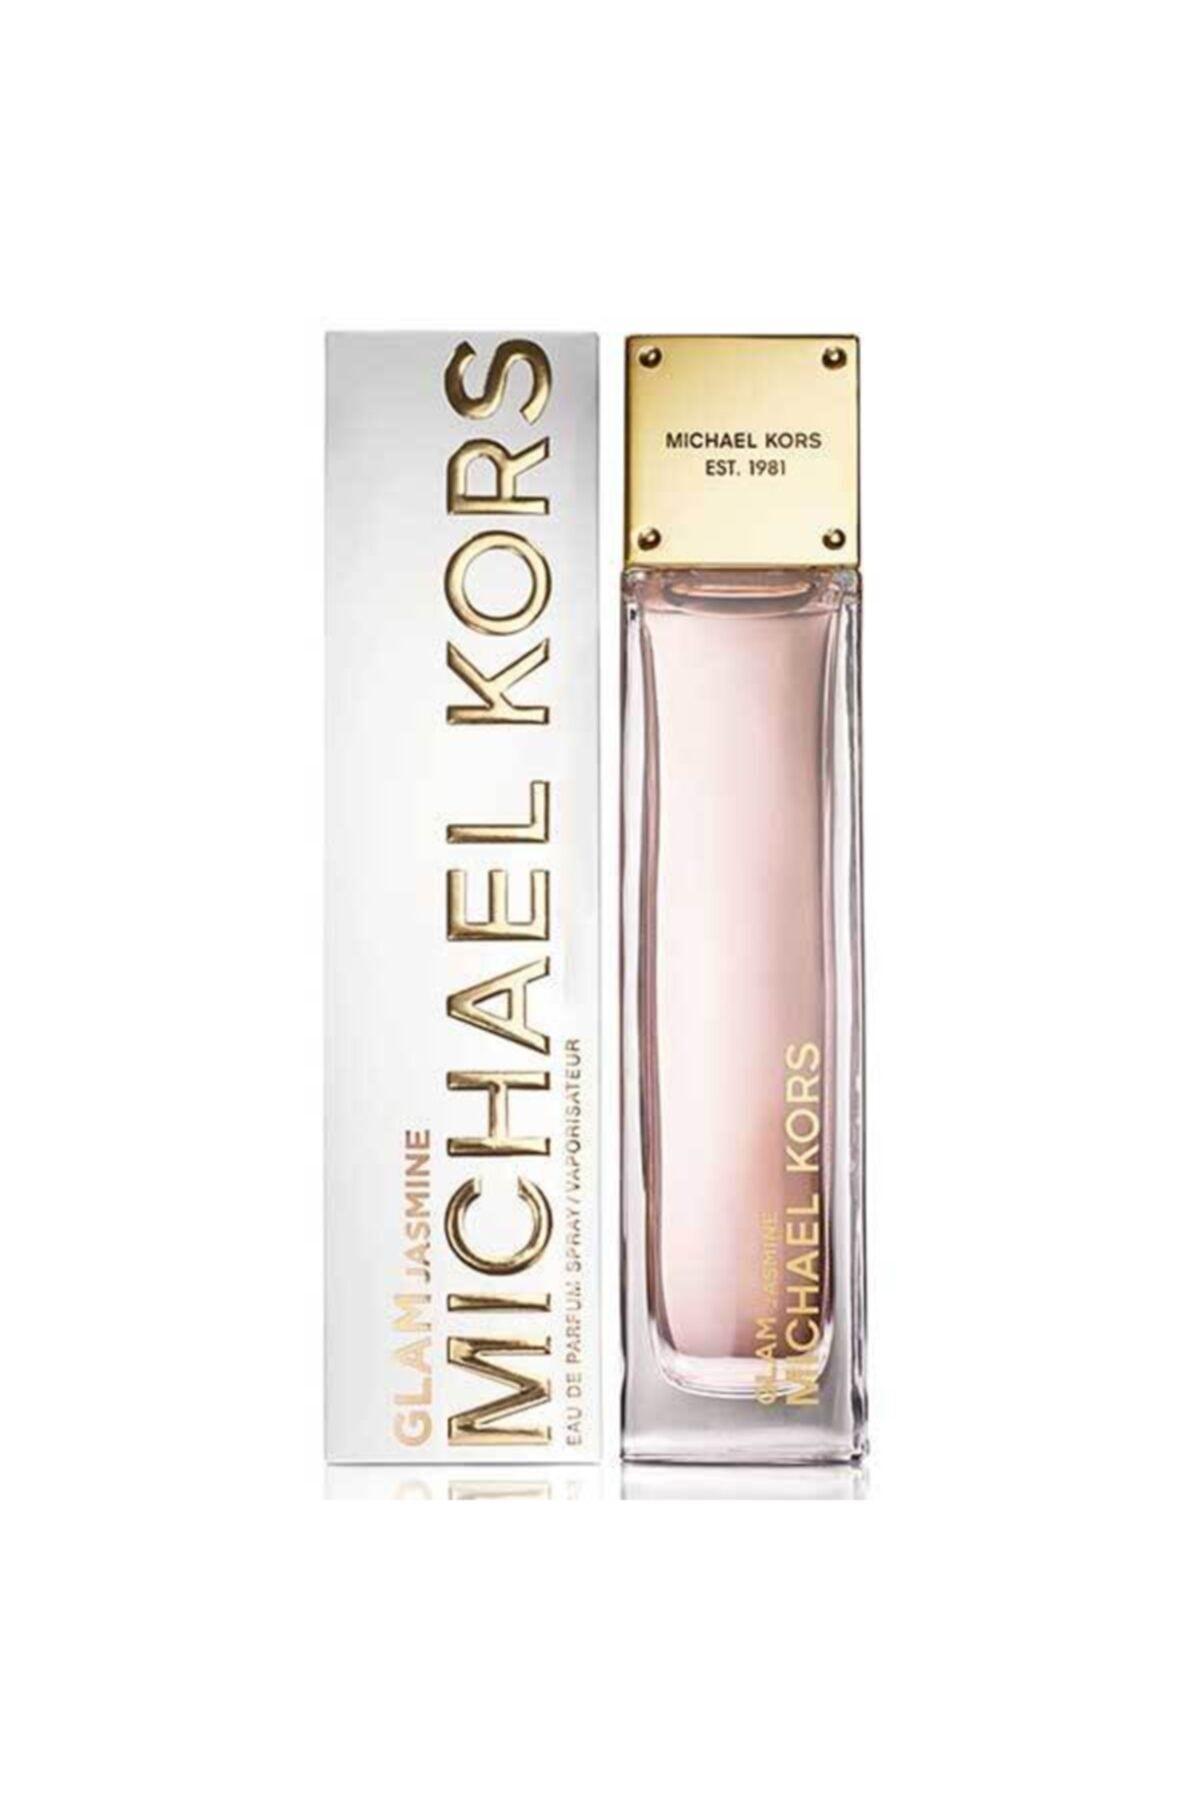 Michael Kors Glam Jasmine Edp 100 ml Kadın Parfüm 022548289716 2